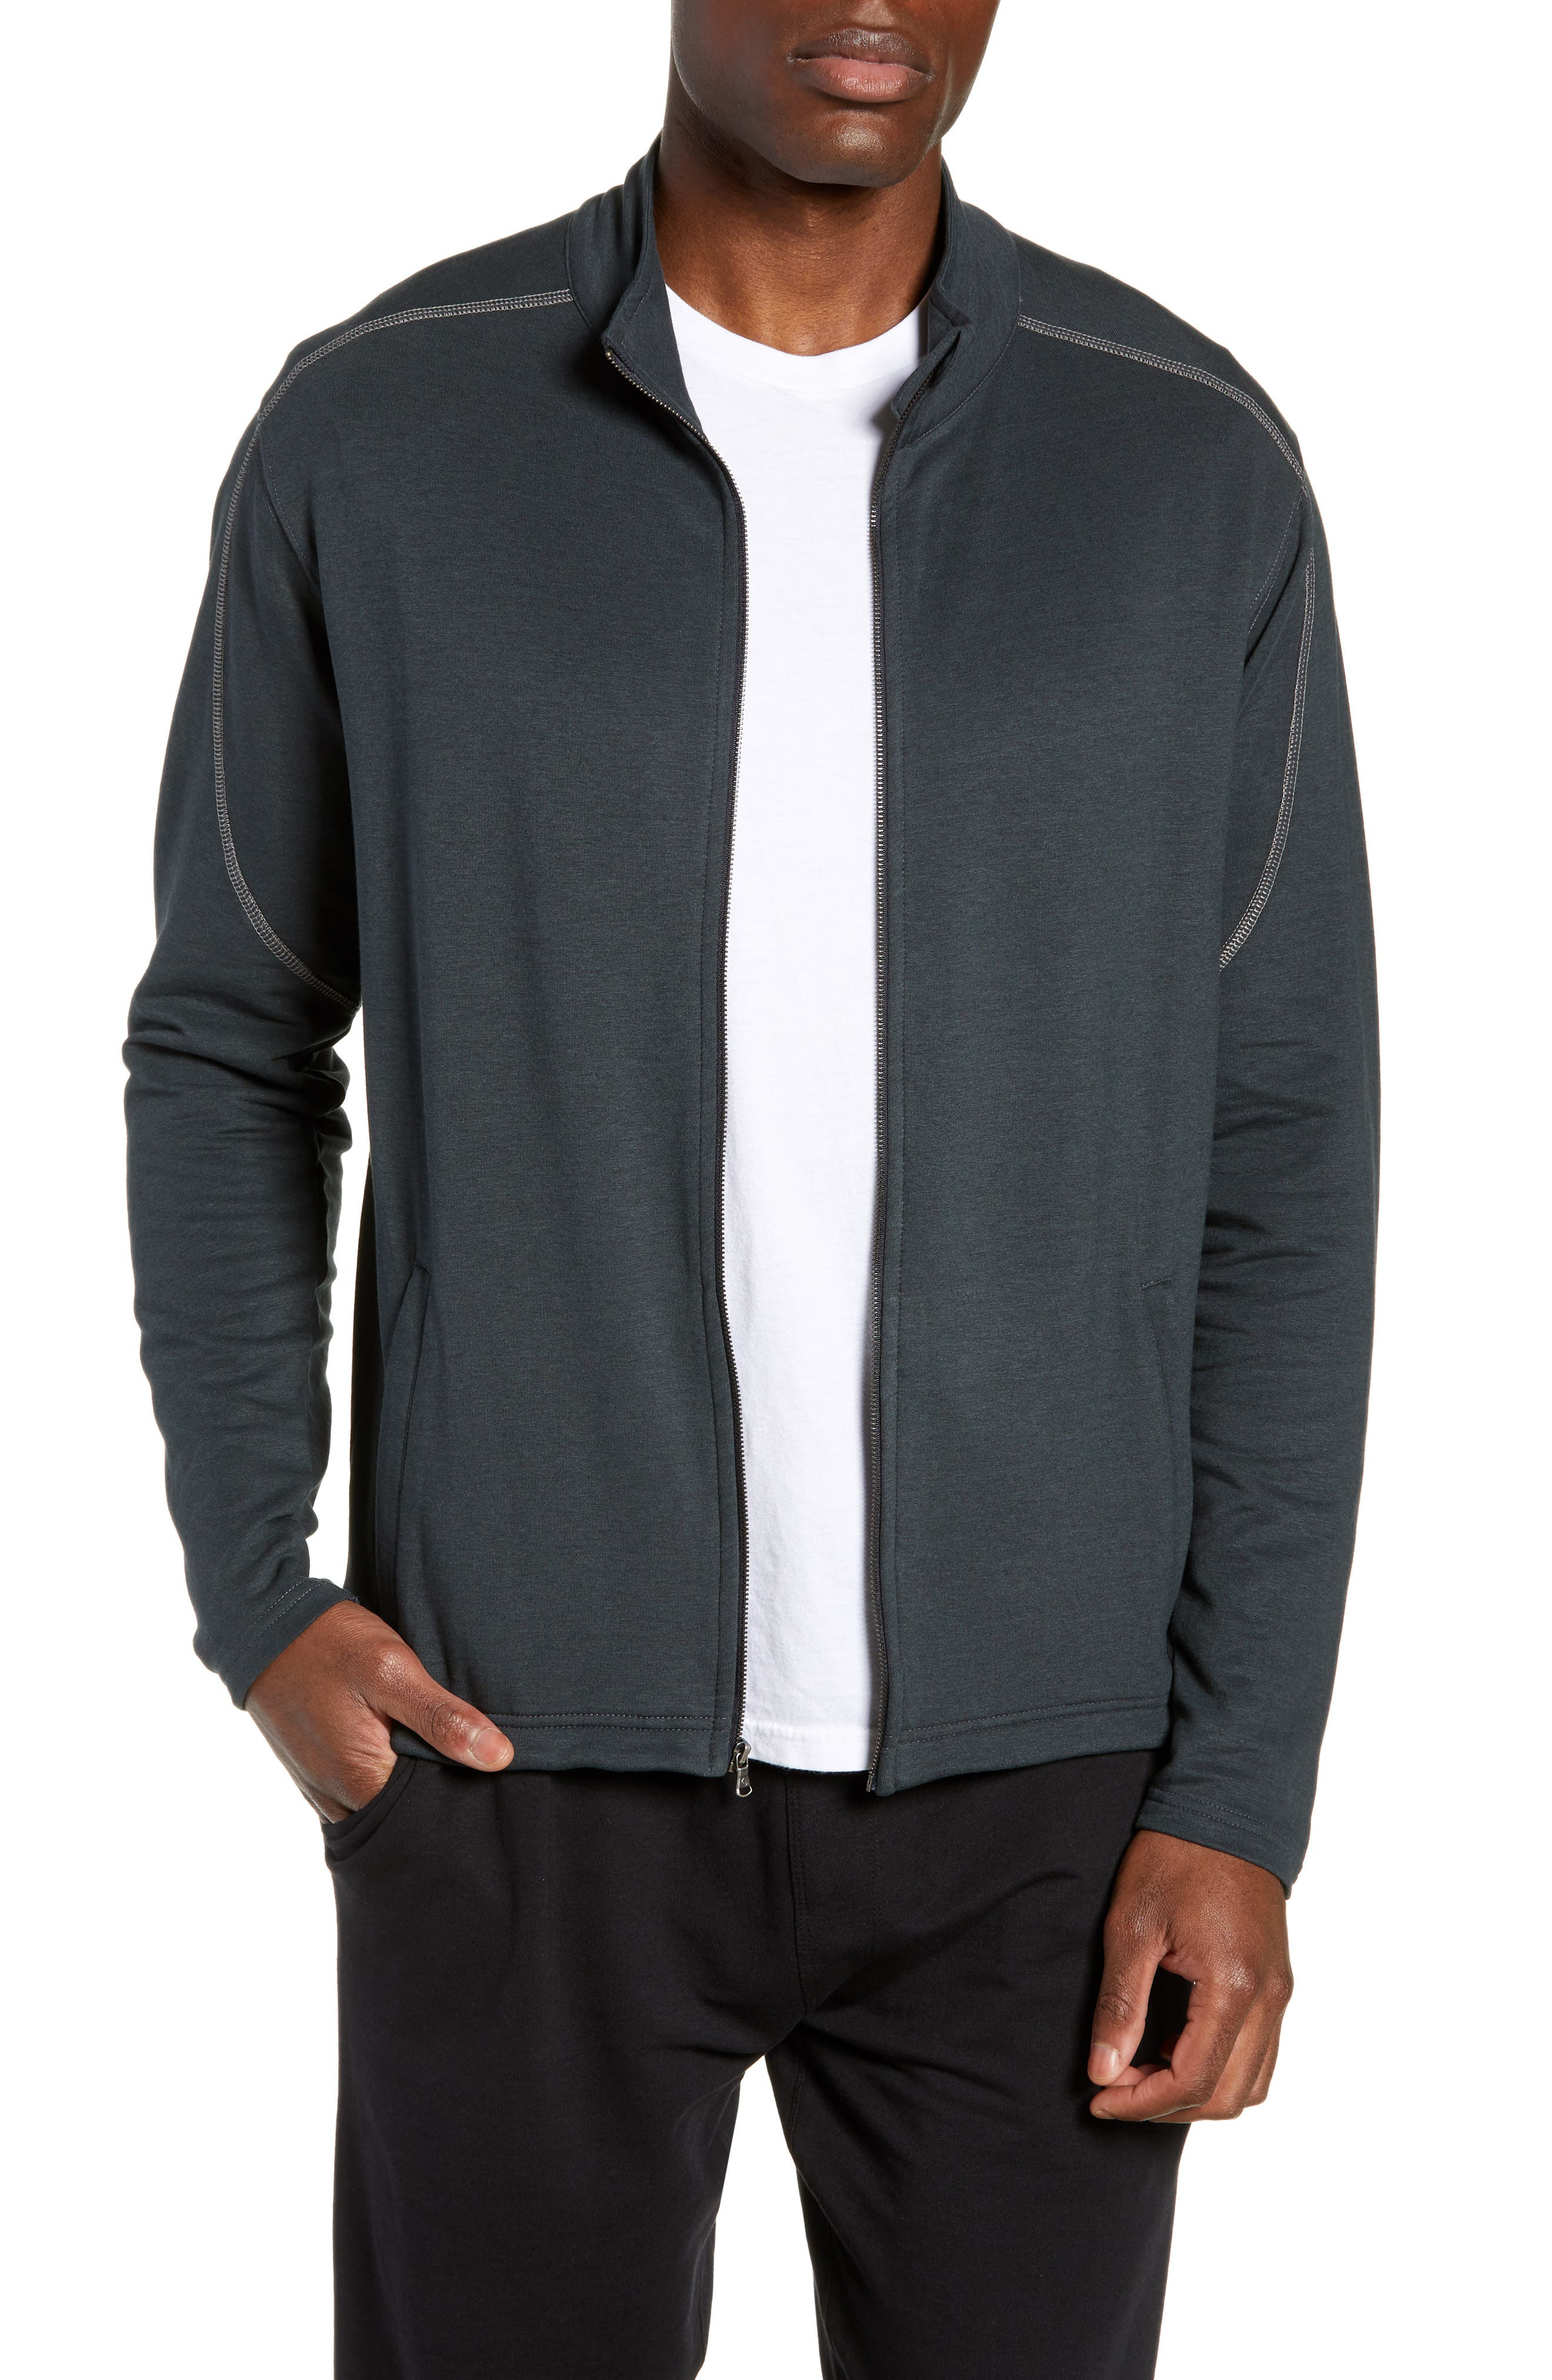 Tasc Performance Tahoe Ii Fleece Jacket, Grey